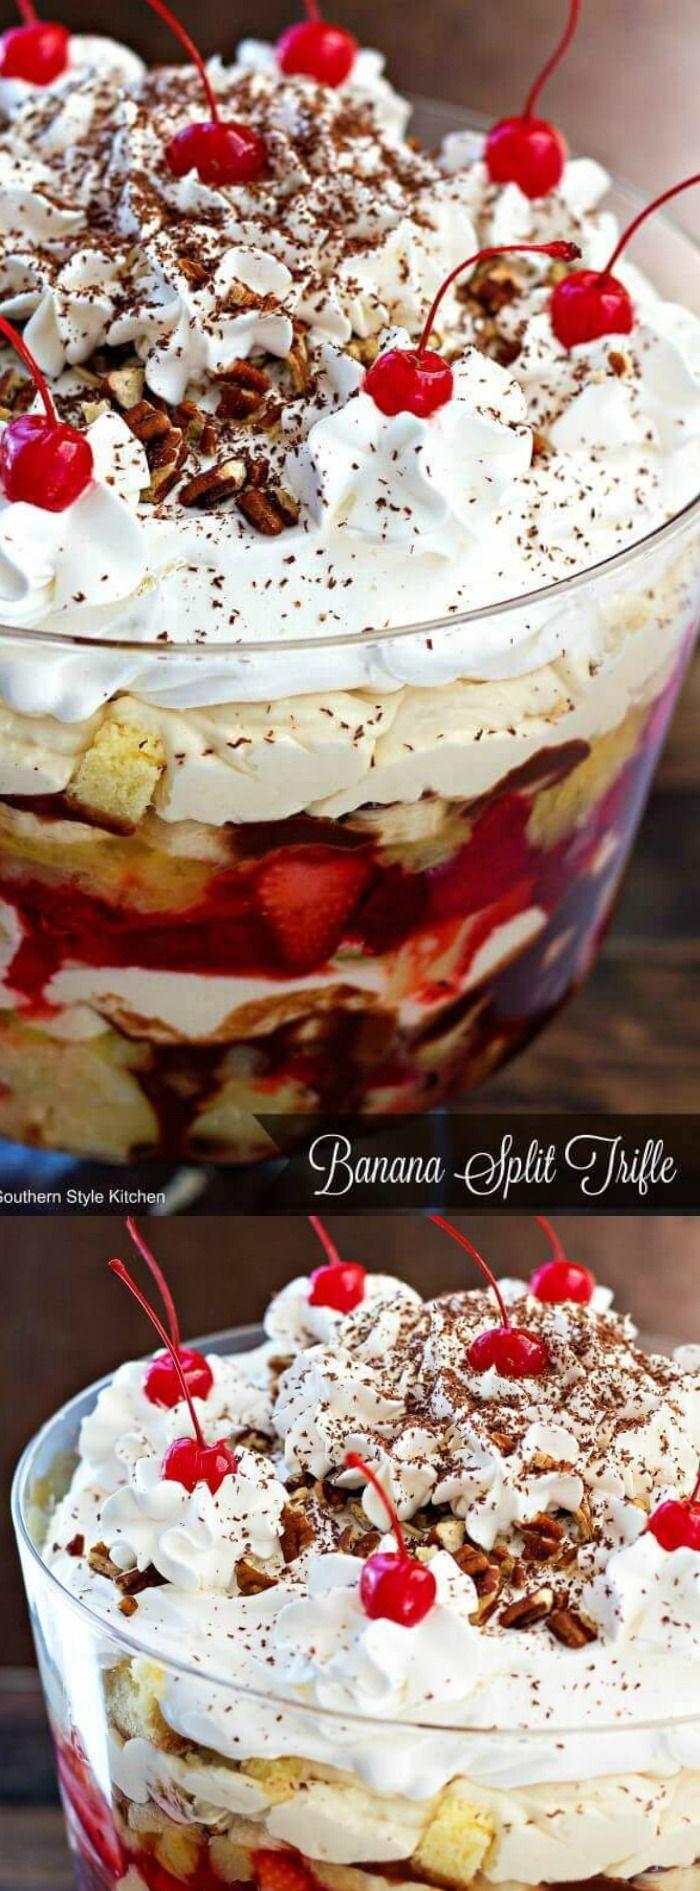 40 Best Trifle Recipes Images On Pinterest Dessert